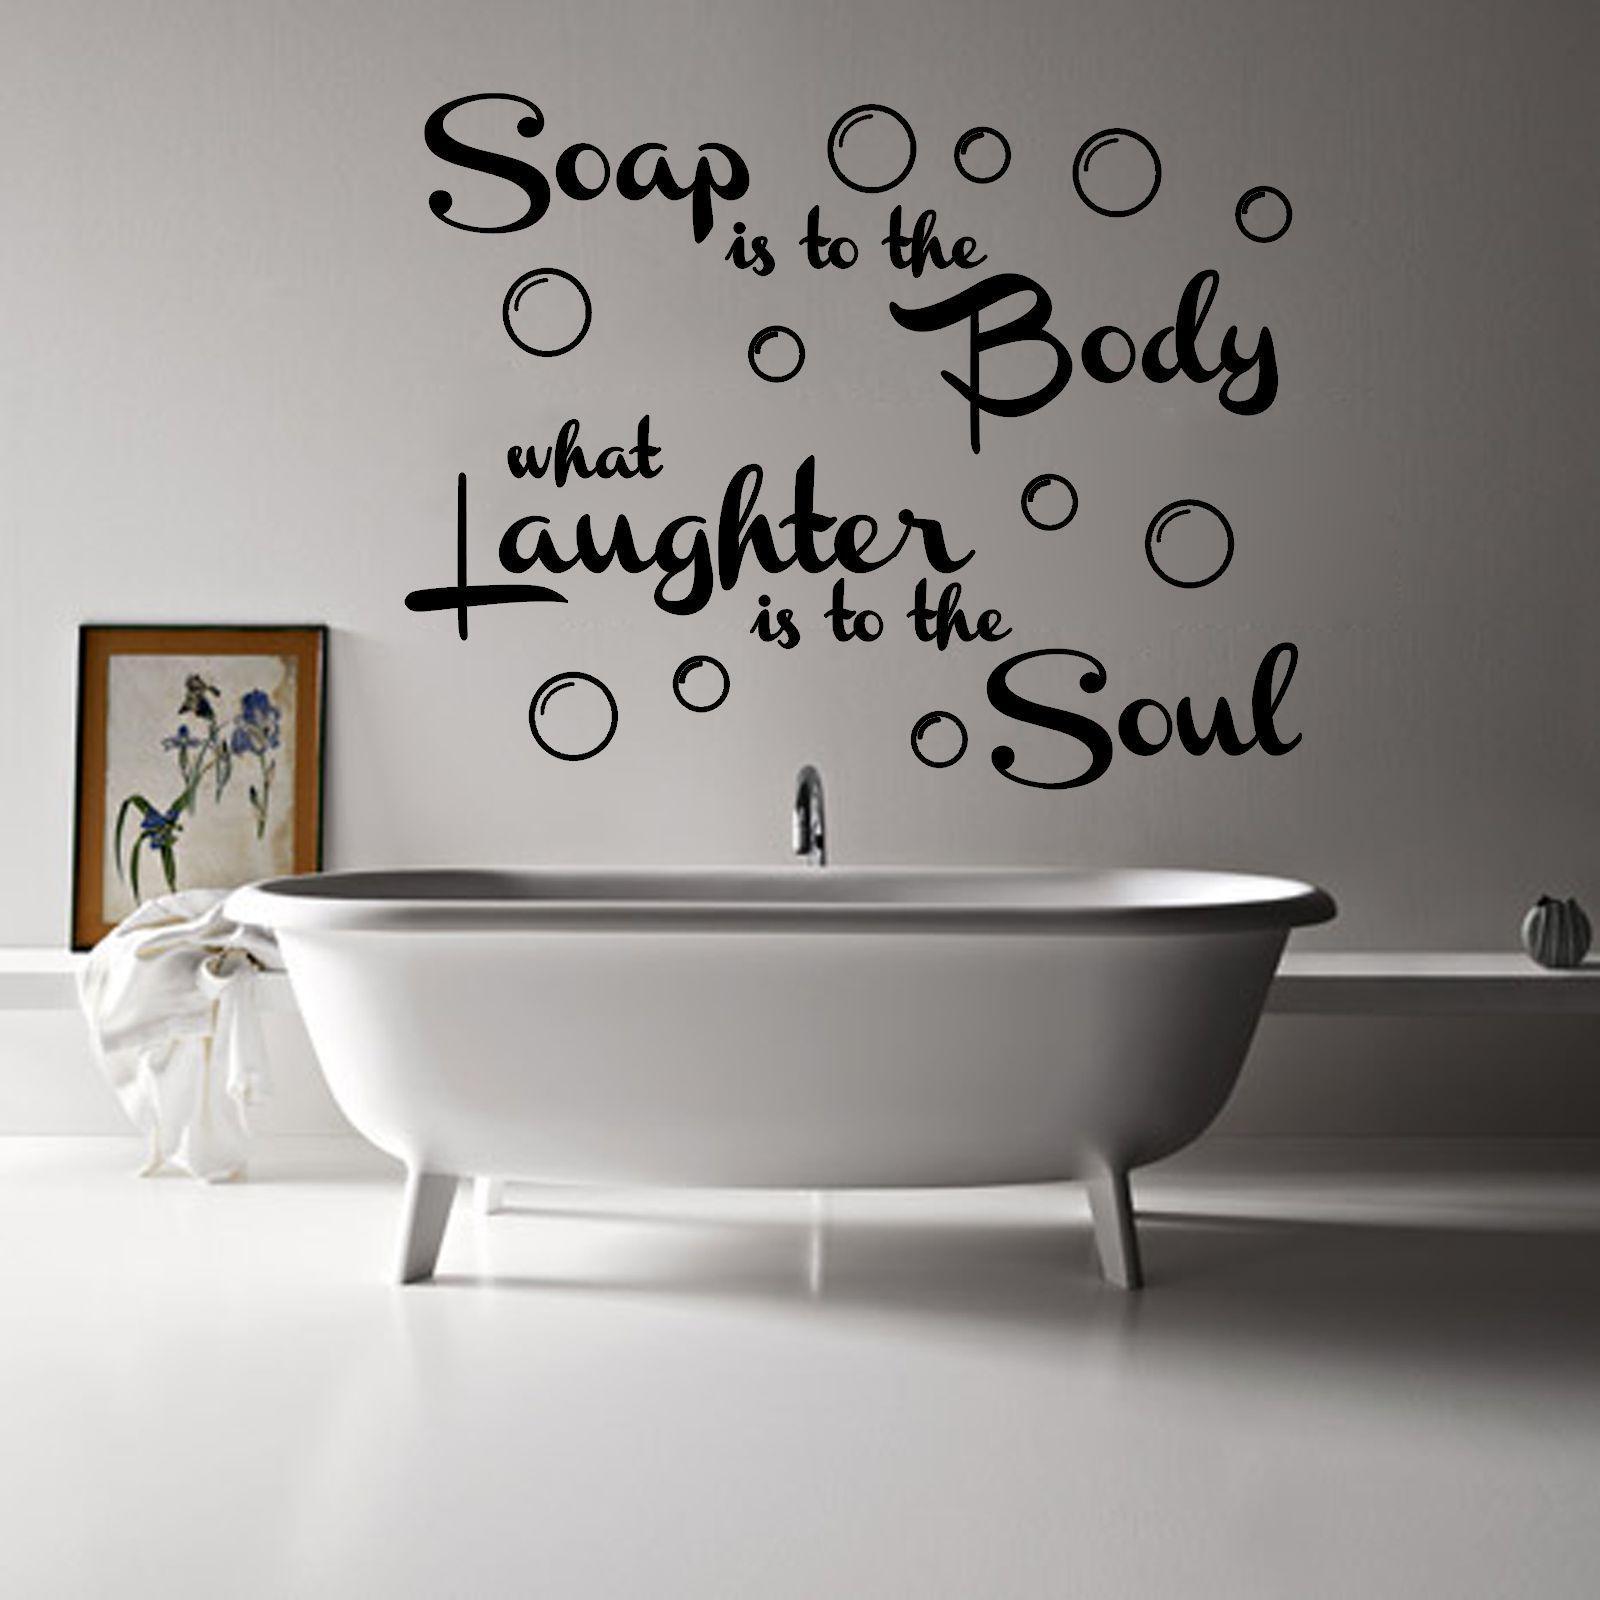 Bathroom wall decor quotes - Bathroom Wall Art Quotes Makipera Home Decor